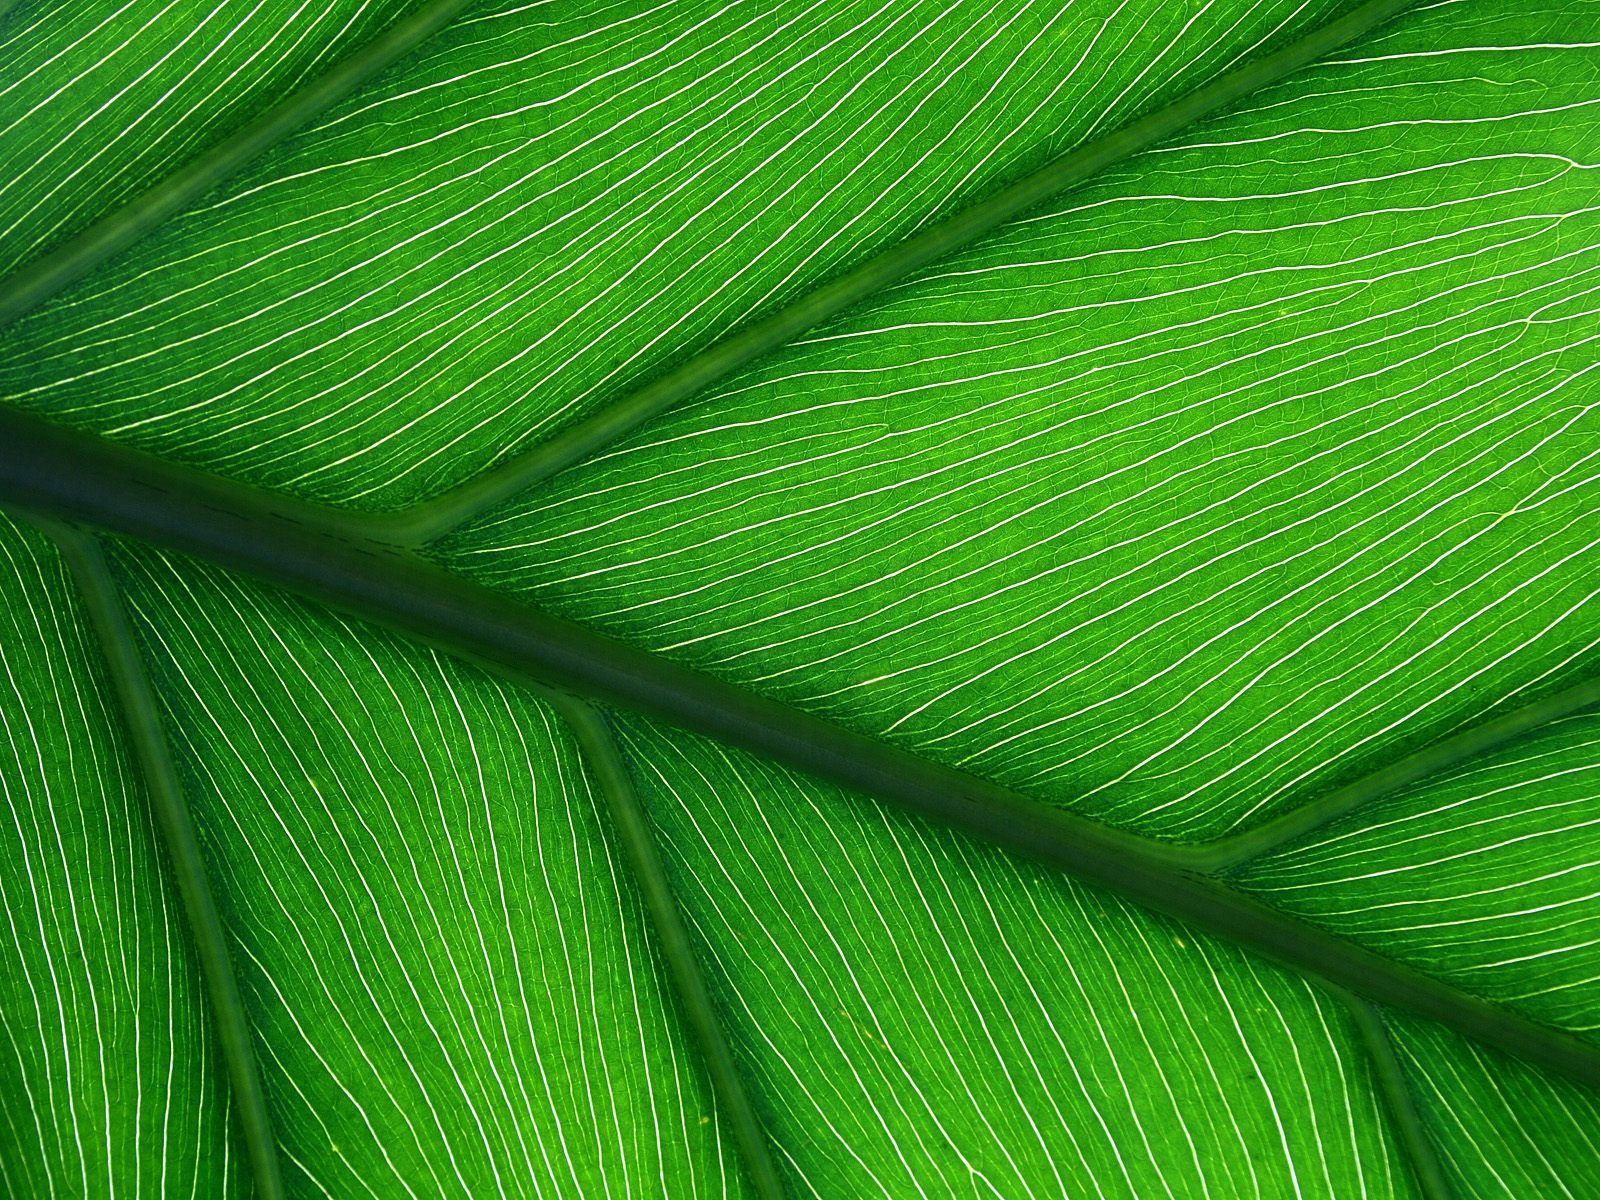 Green Leaf Leaf texture, Plant wallpaper, Texture